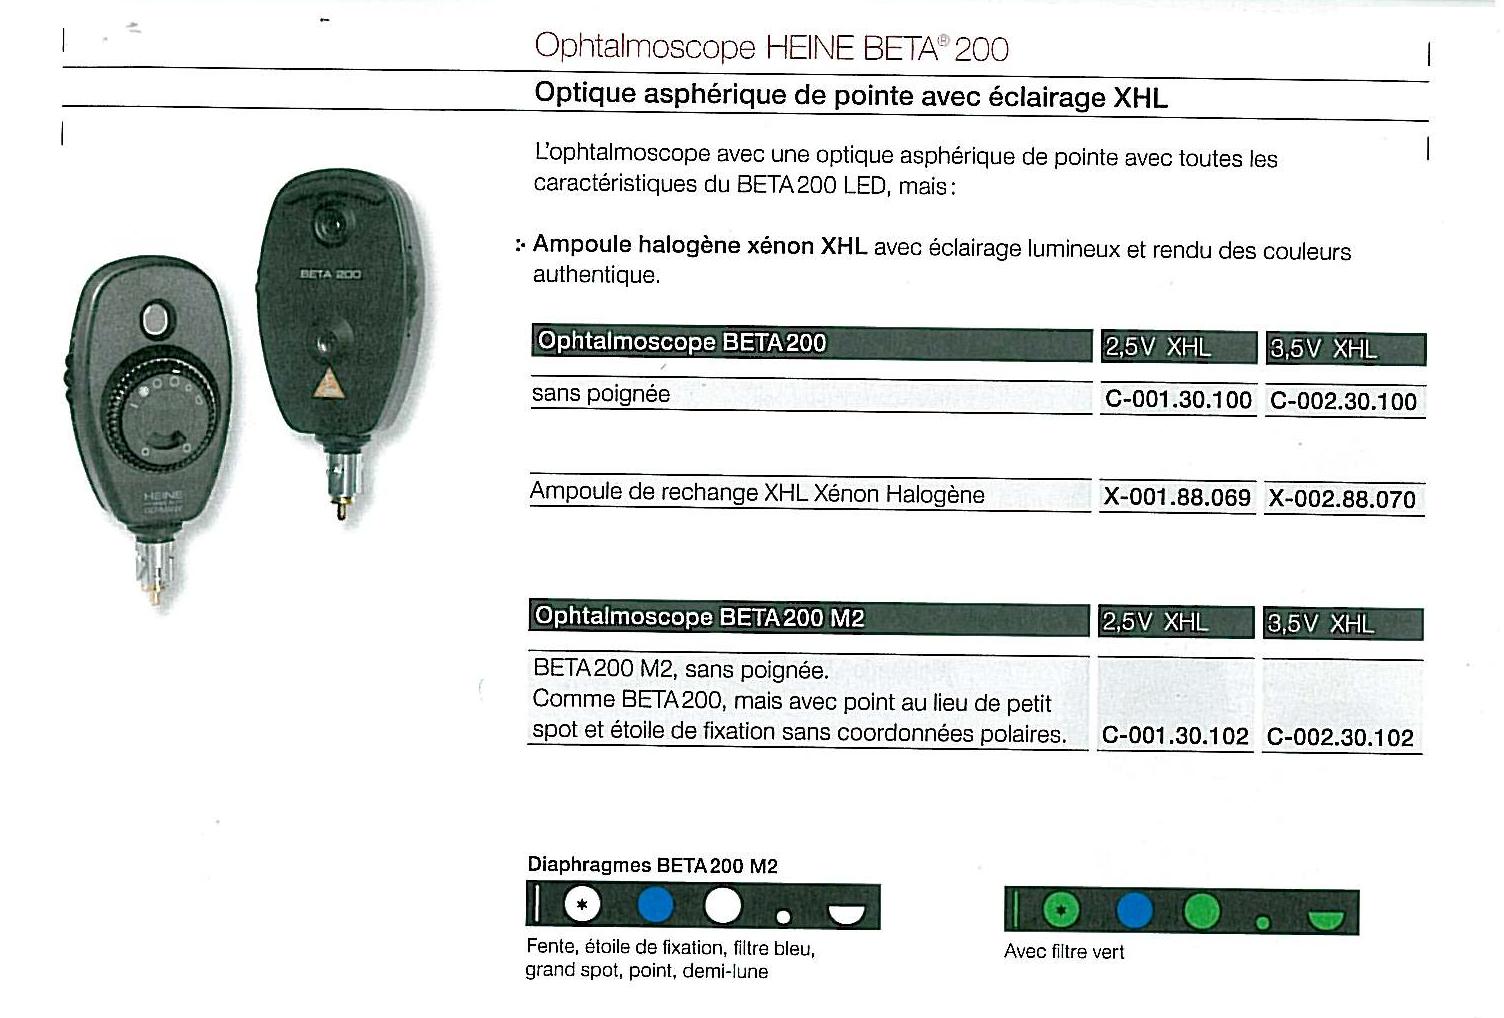 ophtalmoscope Heine Beta 200